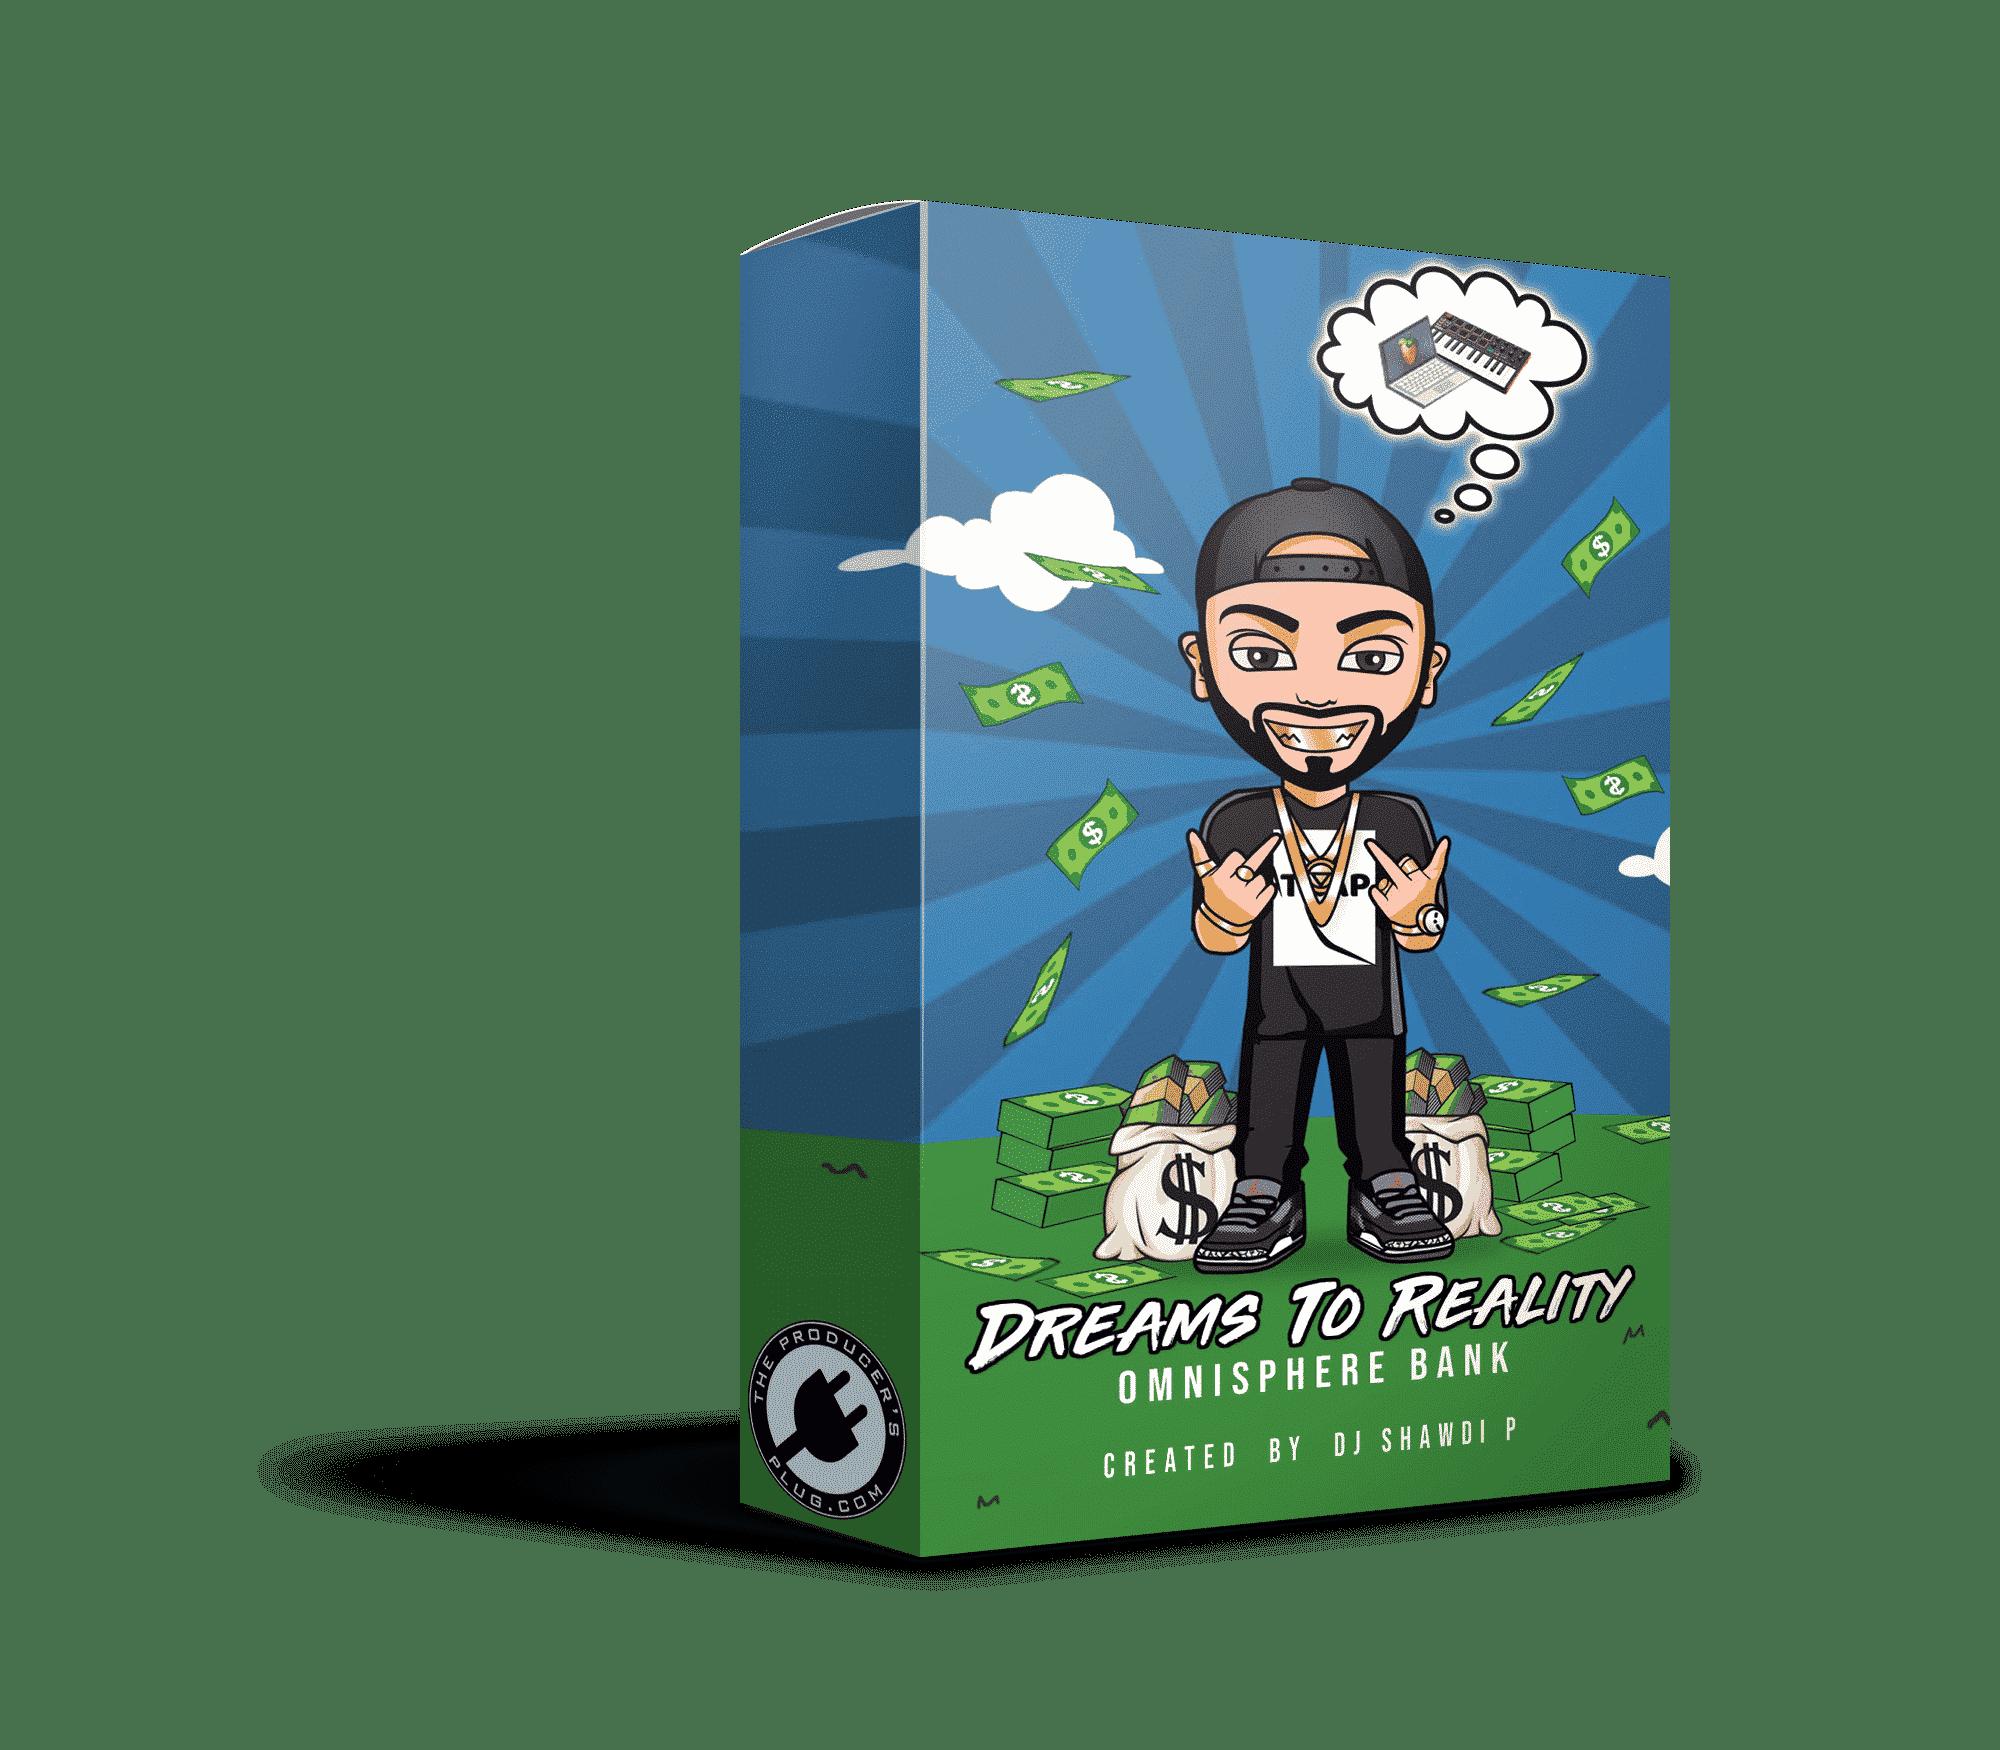 The Producer's Plug - DJ Shawdi P - Dreams To Reality (Omnisphere Bank)